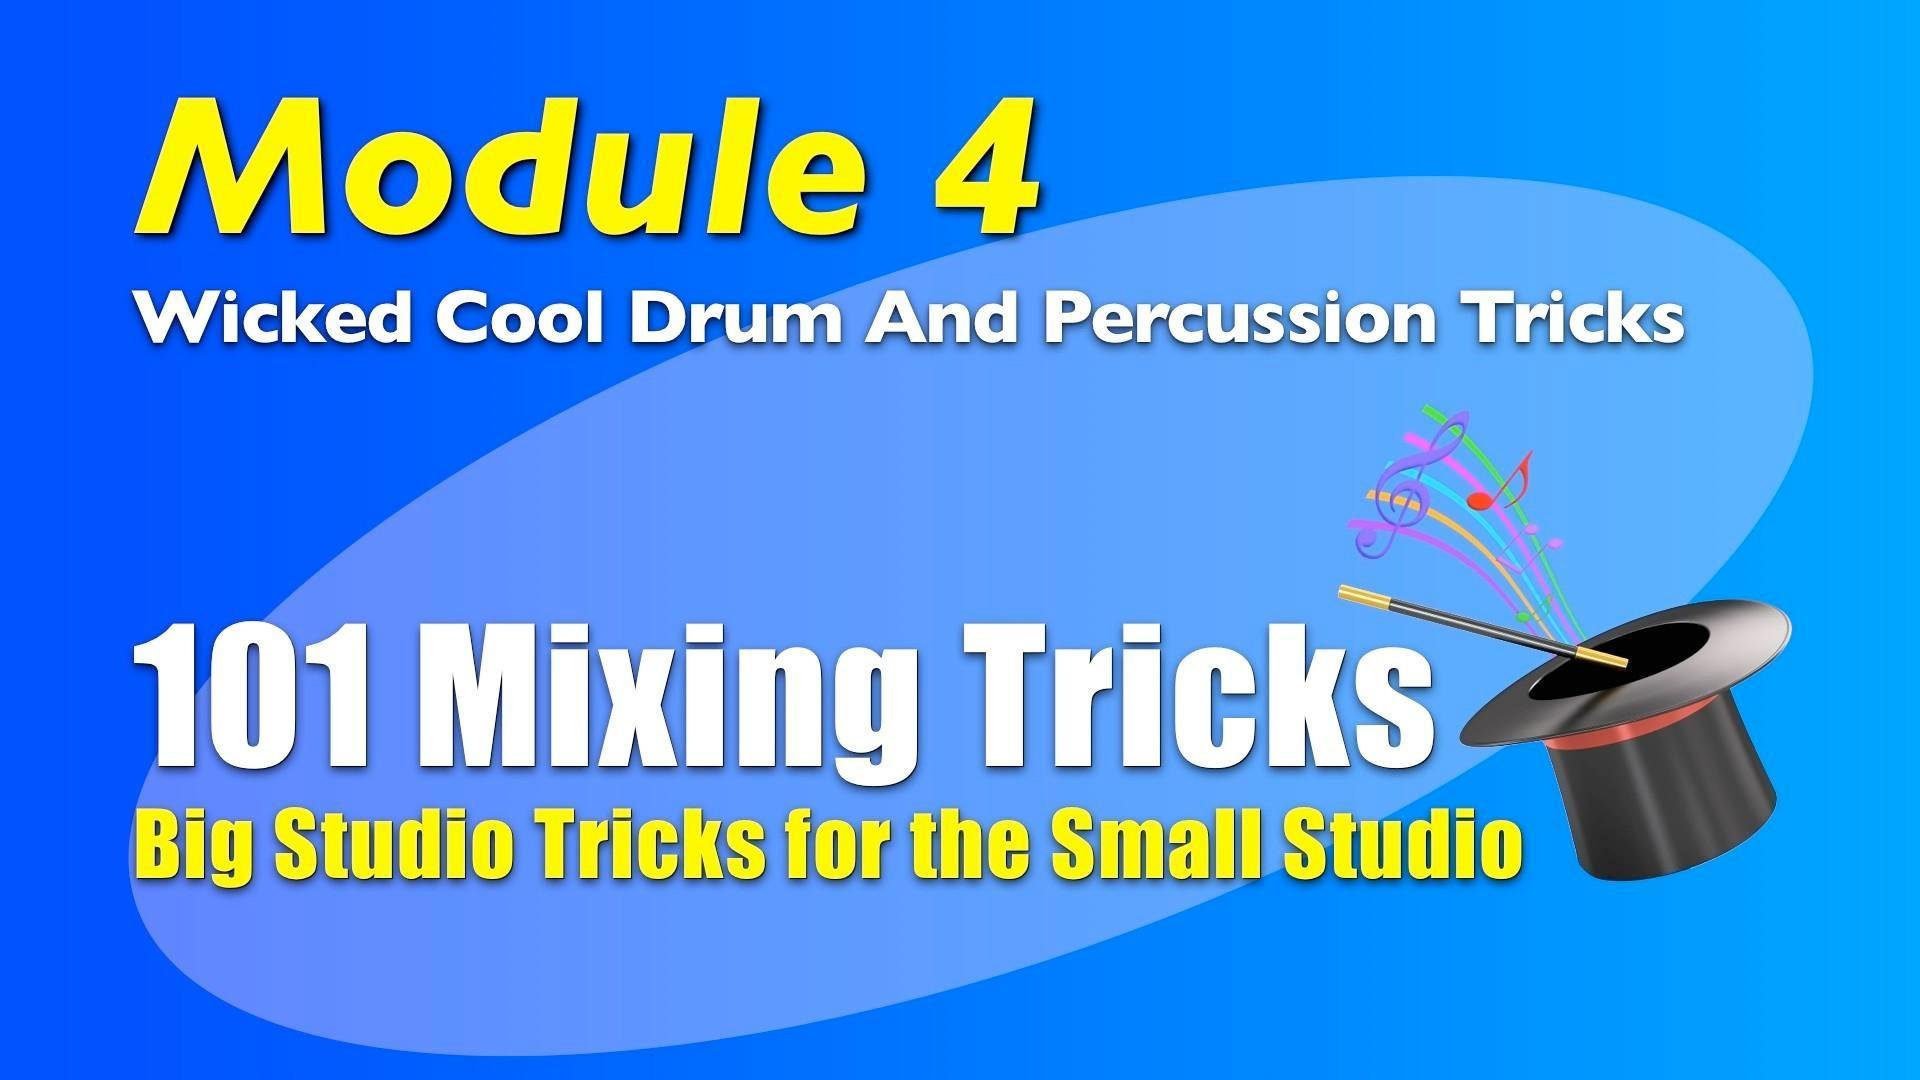 101 Mixing Tricks Module 1 title image